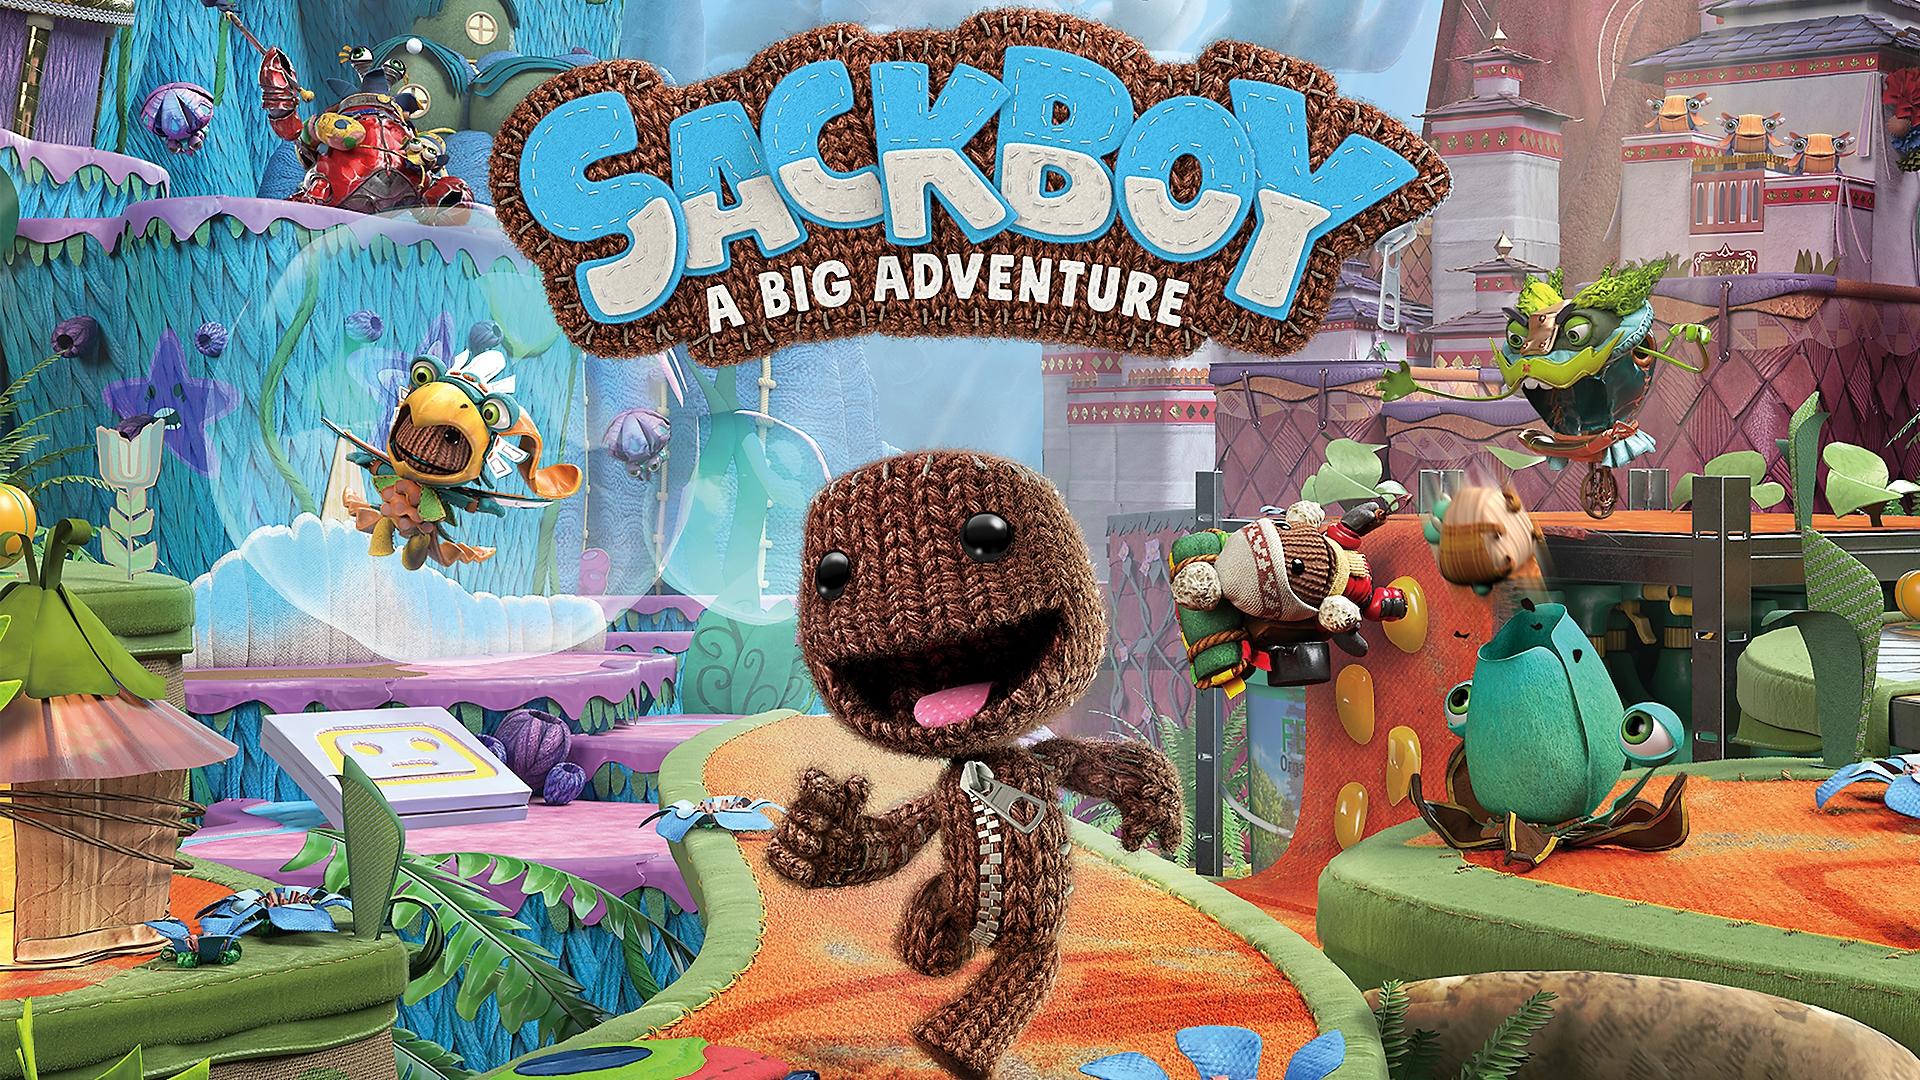 Sackboy: A Big Adventure - العرض التشويقي لإطلاق اللعبة